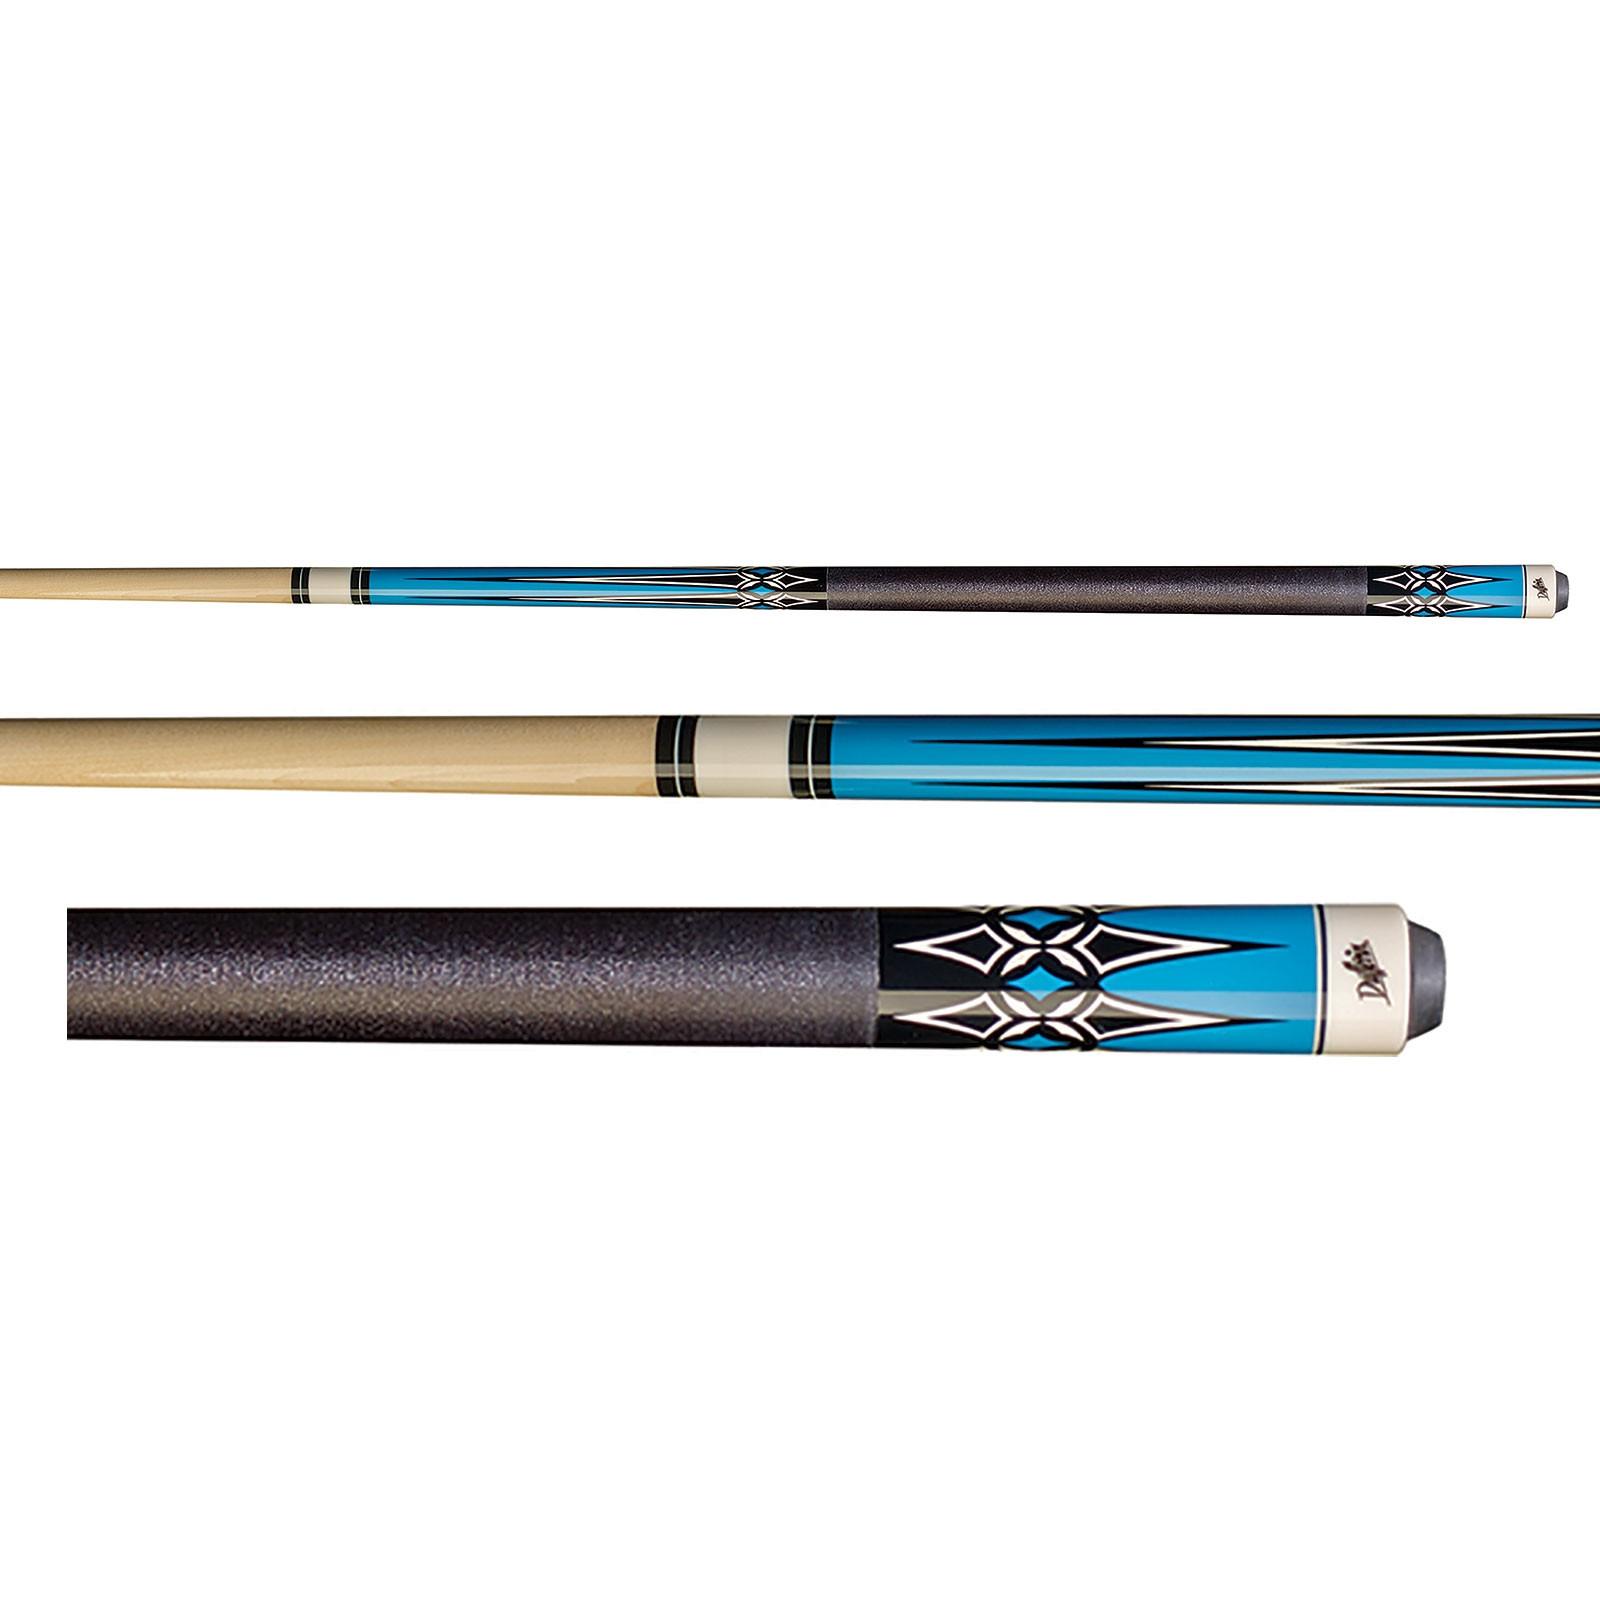 Dufferin D-332B Blue Pool Cue Stick